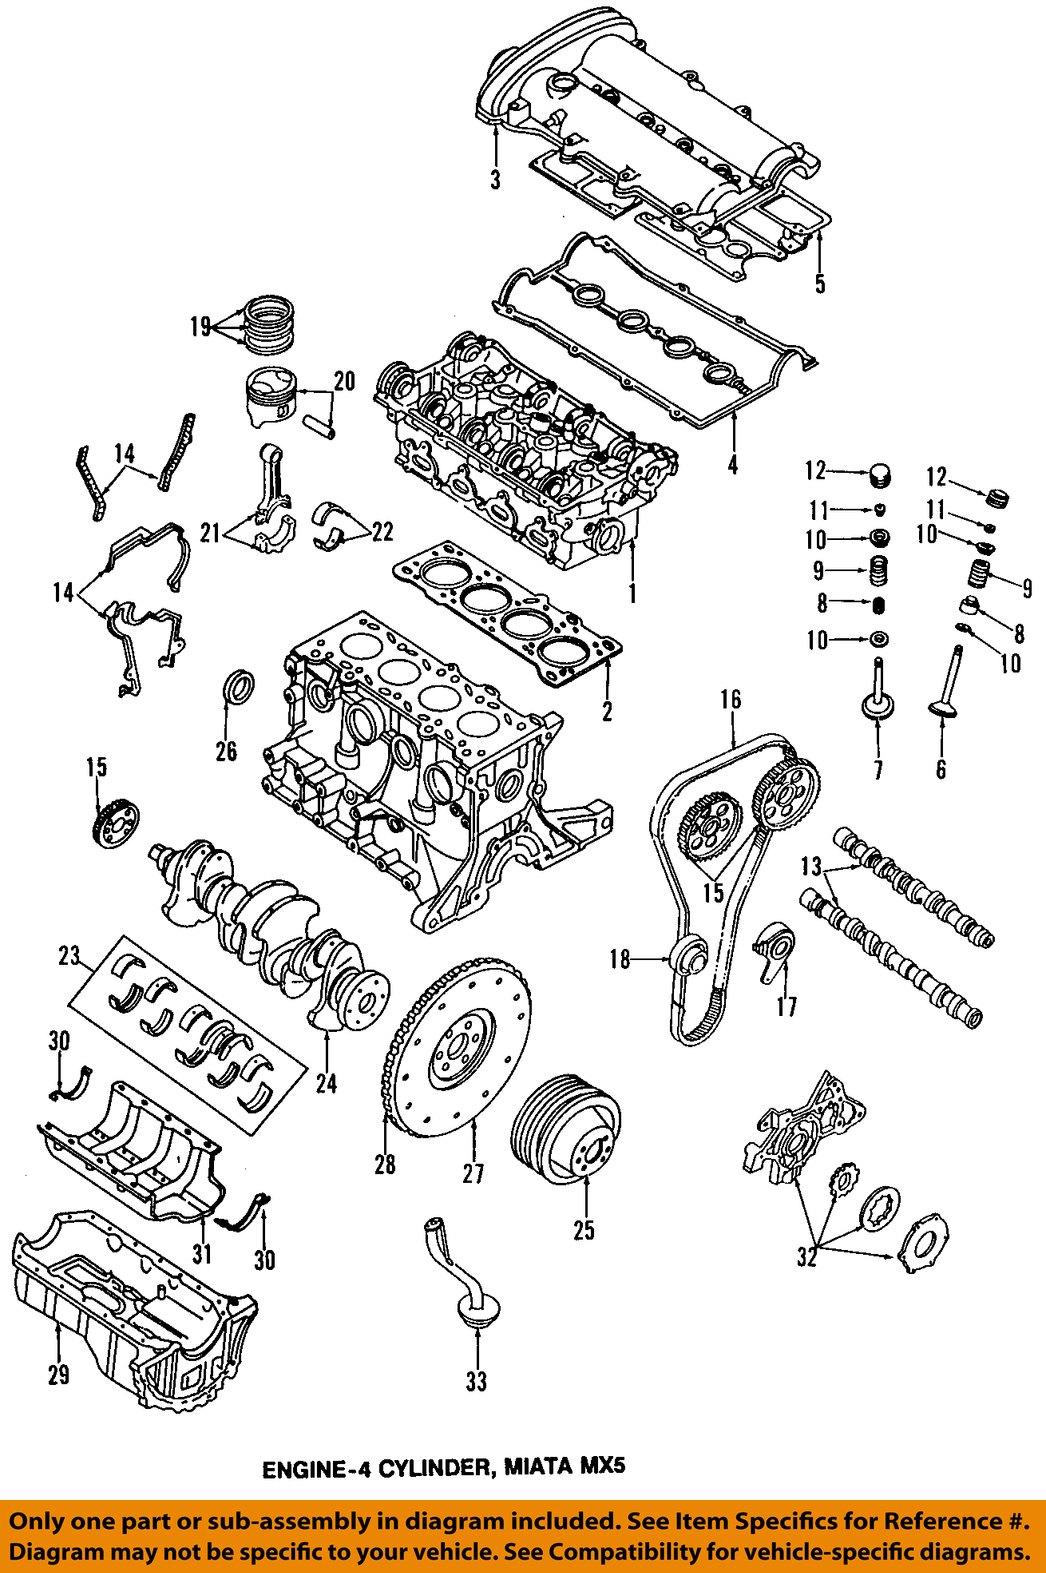 2003 Mazda Protege Head Gasketengine Swap Into A 1999 626 1993 2002 Honda Accord Valve Cover Gasket Oem 90 93 Miata B61p10235b Ebay